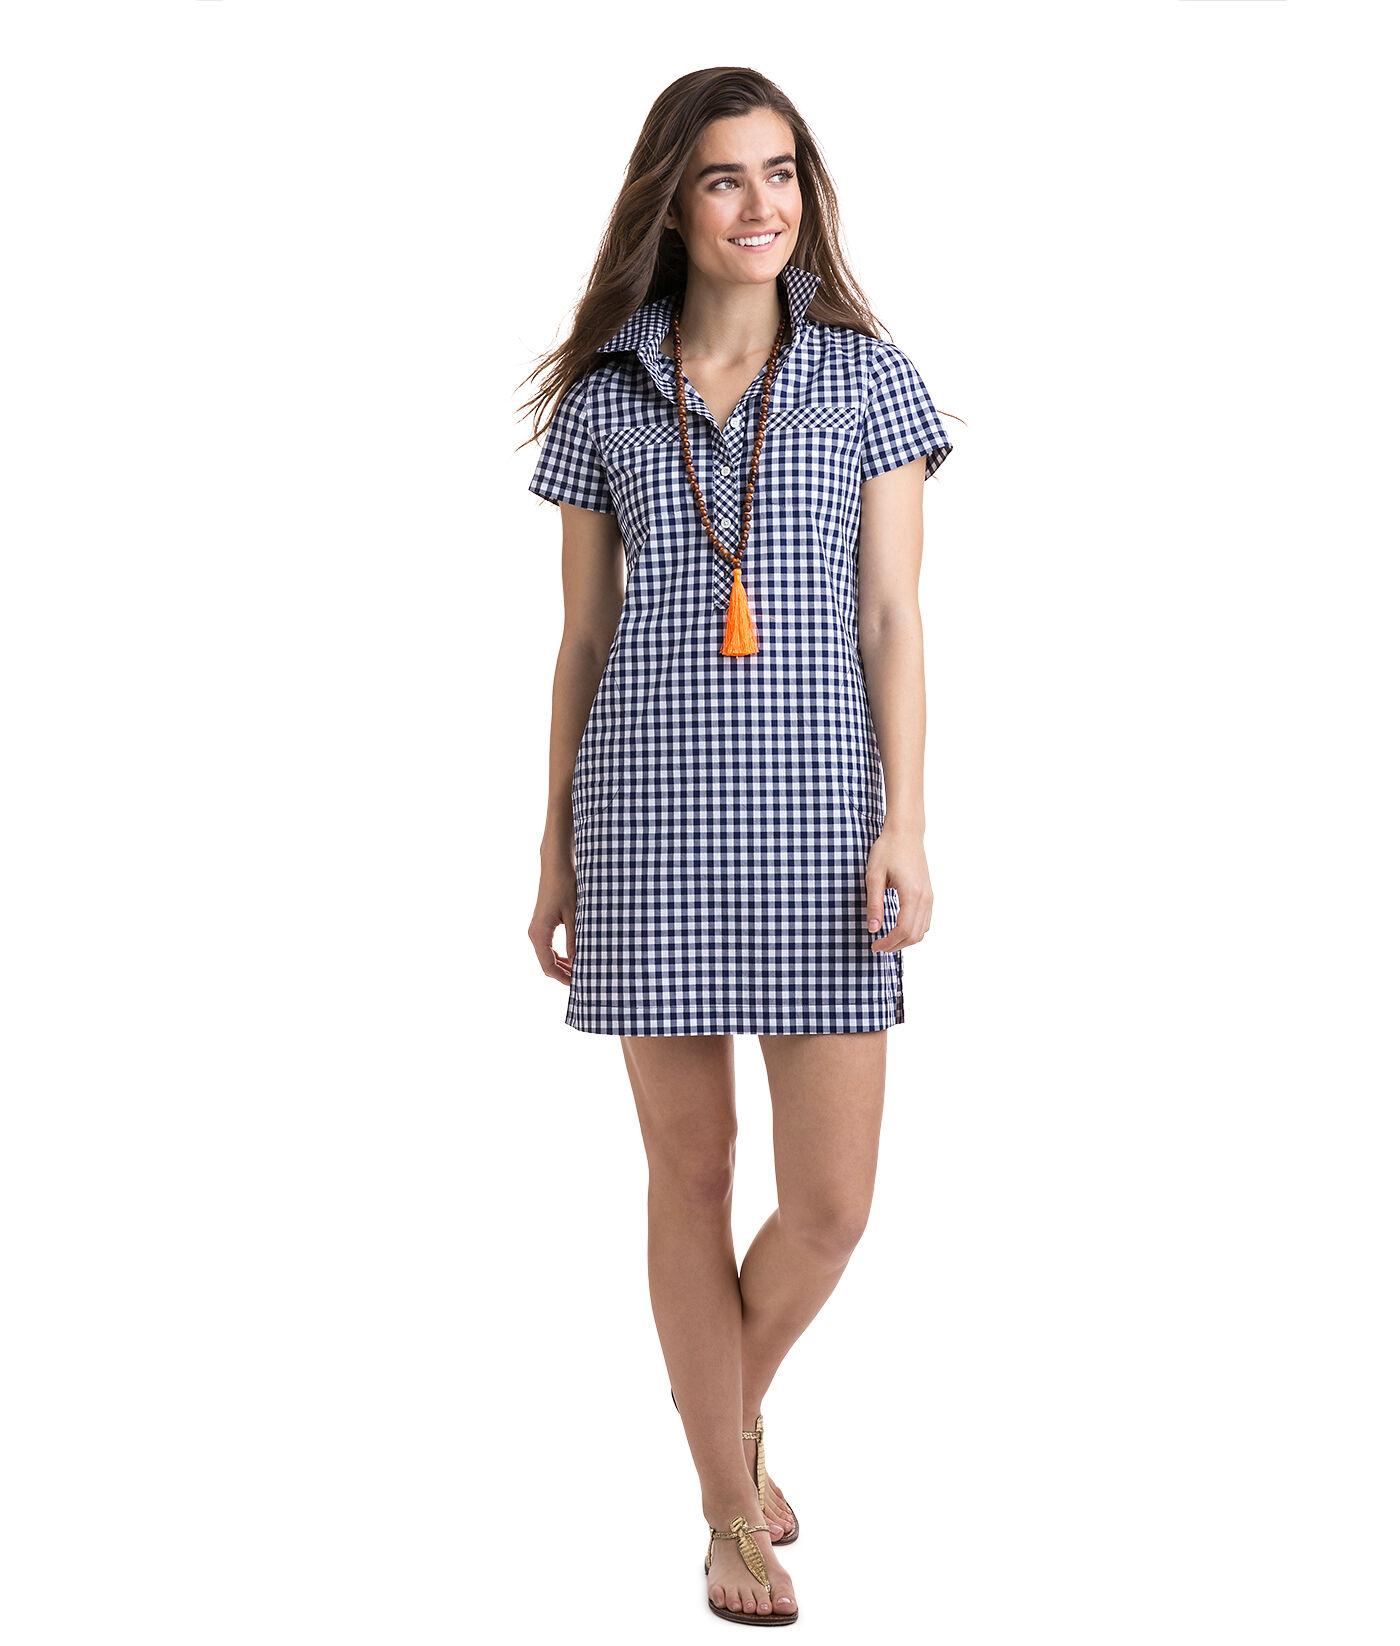 Women\u0027s Clothing: Preppy \u0026 Classic Clothes - Vineyard Vines